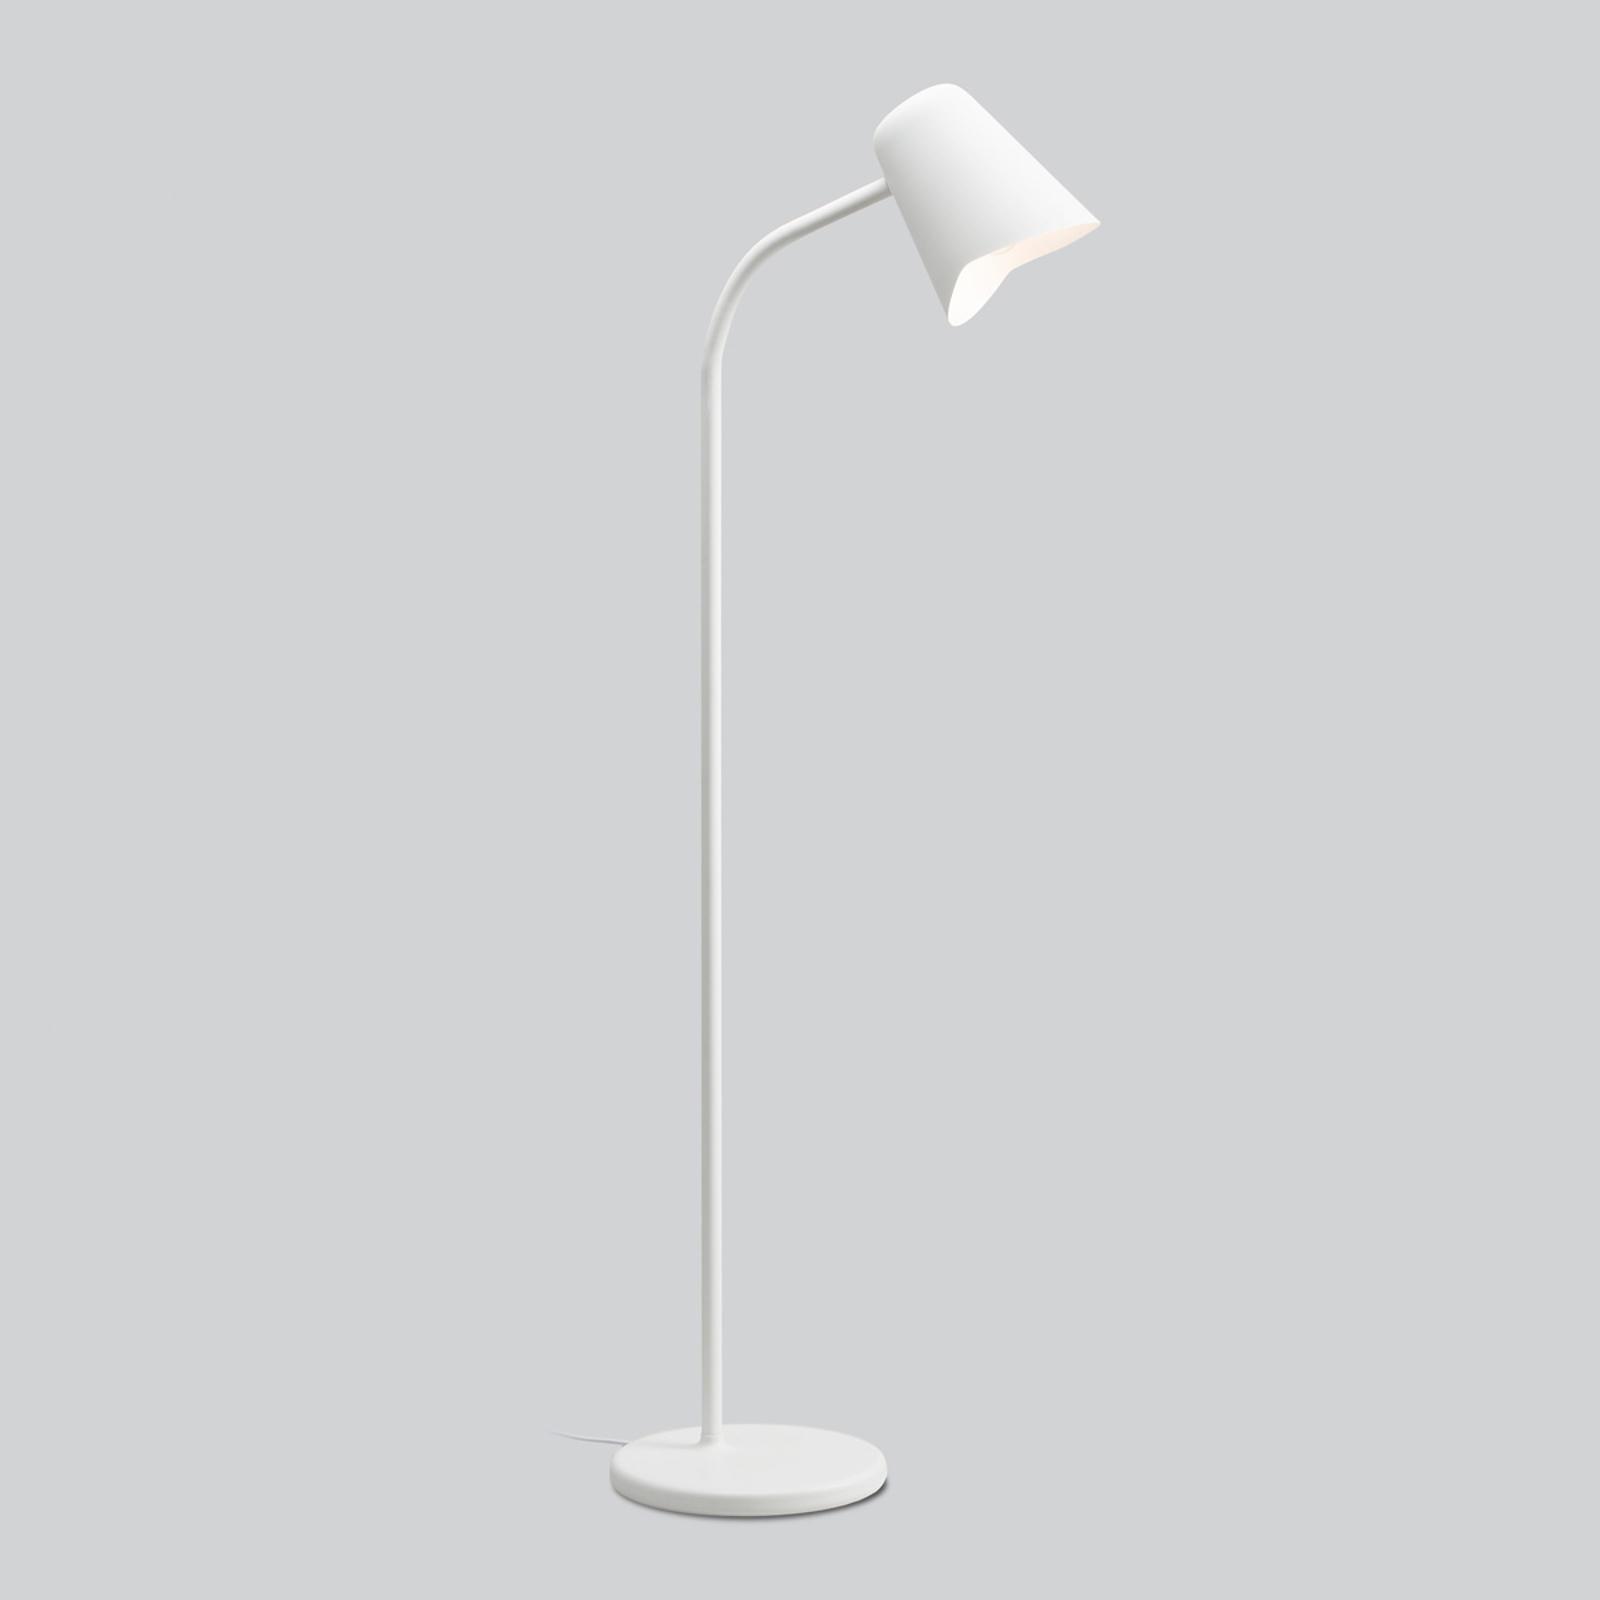 Flexibele vloerlamp Me in wit